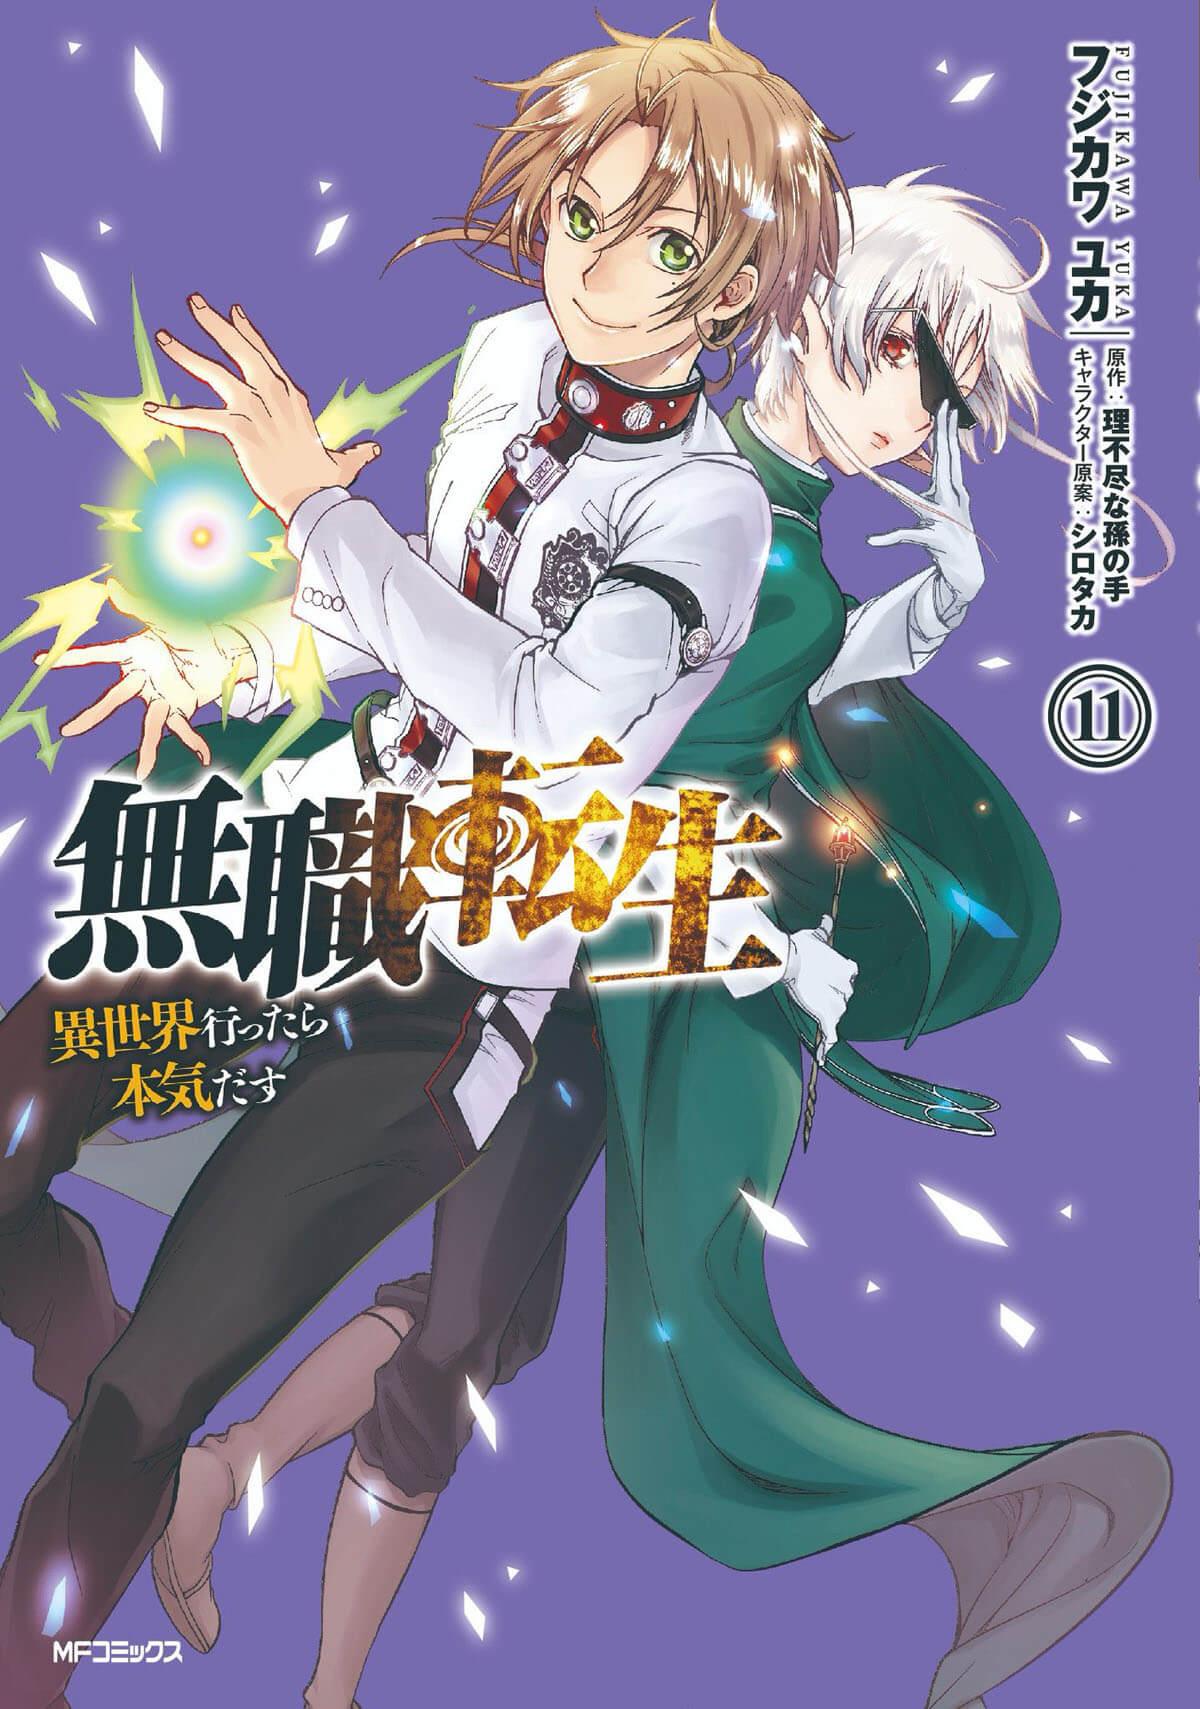 Mushoku Tensei: Jobless Reincarnation Manga Volume 11